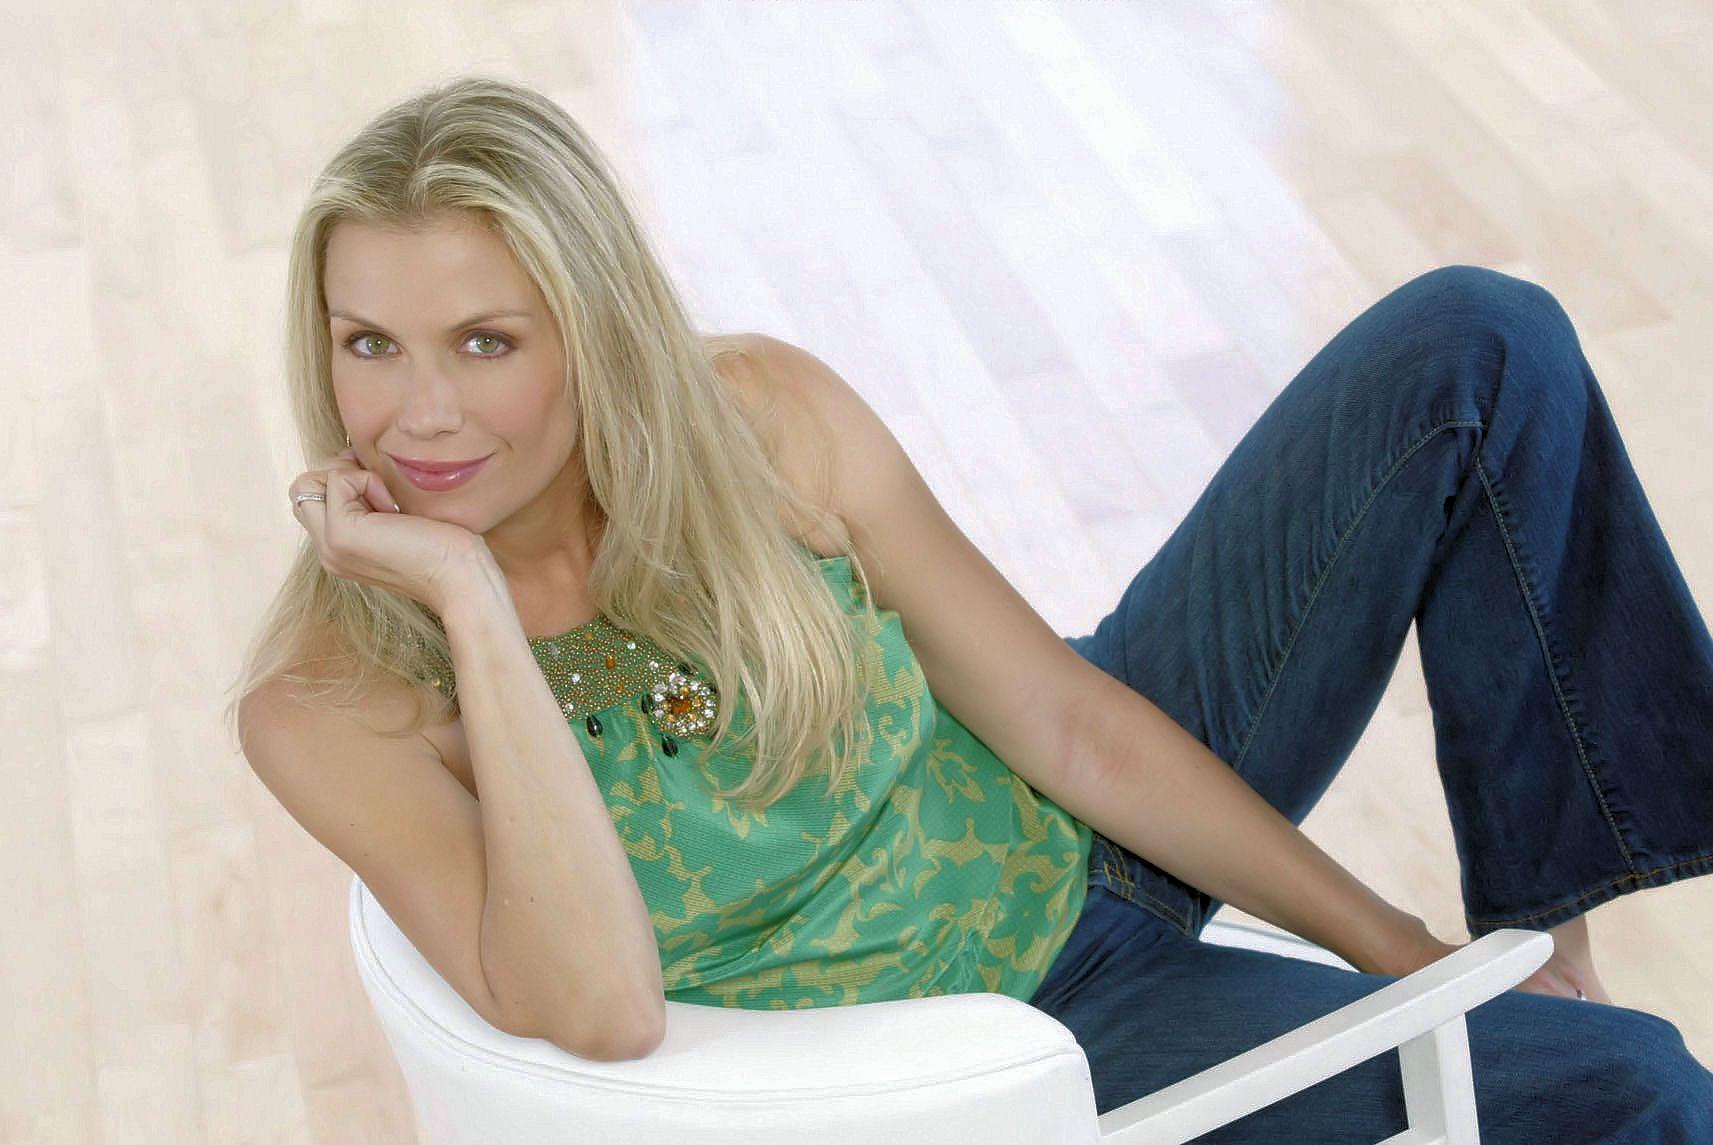 Maria bellucci 14 as aventuras sexuals de ulysses sc1 - 1 2